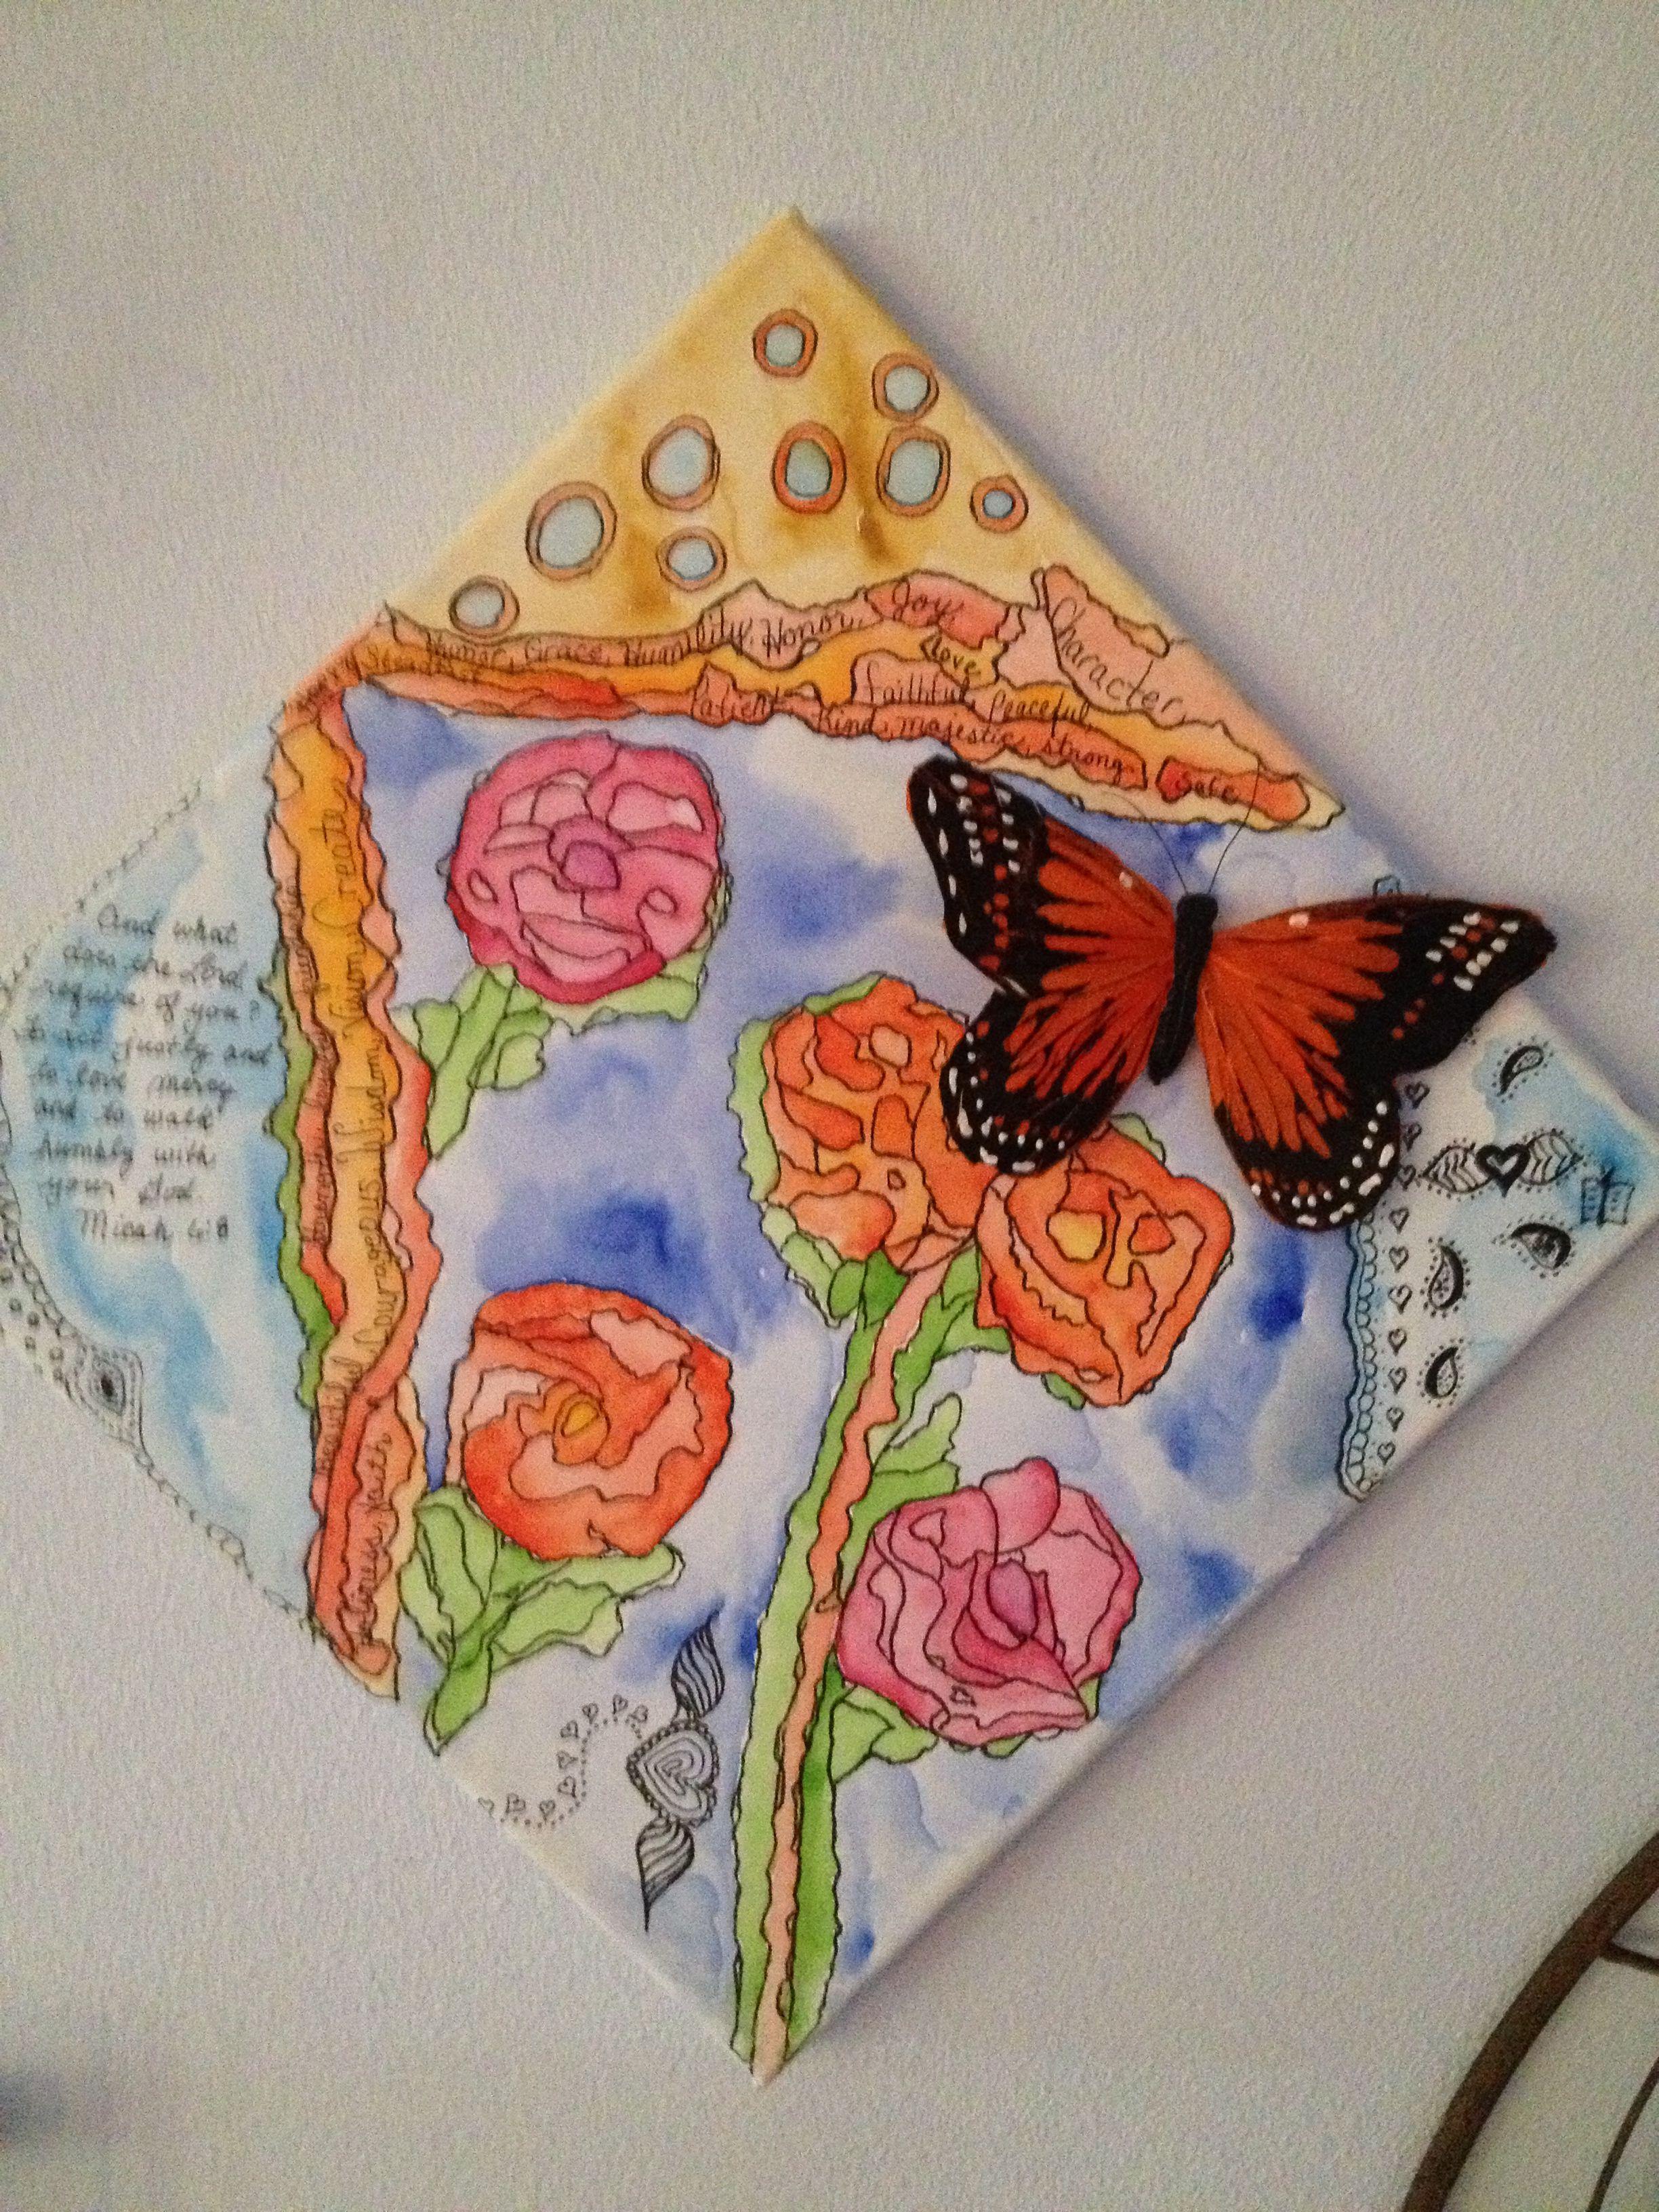 Watercolor And Pencil On Canvas Watercolor Pencil Art Art